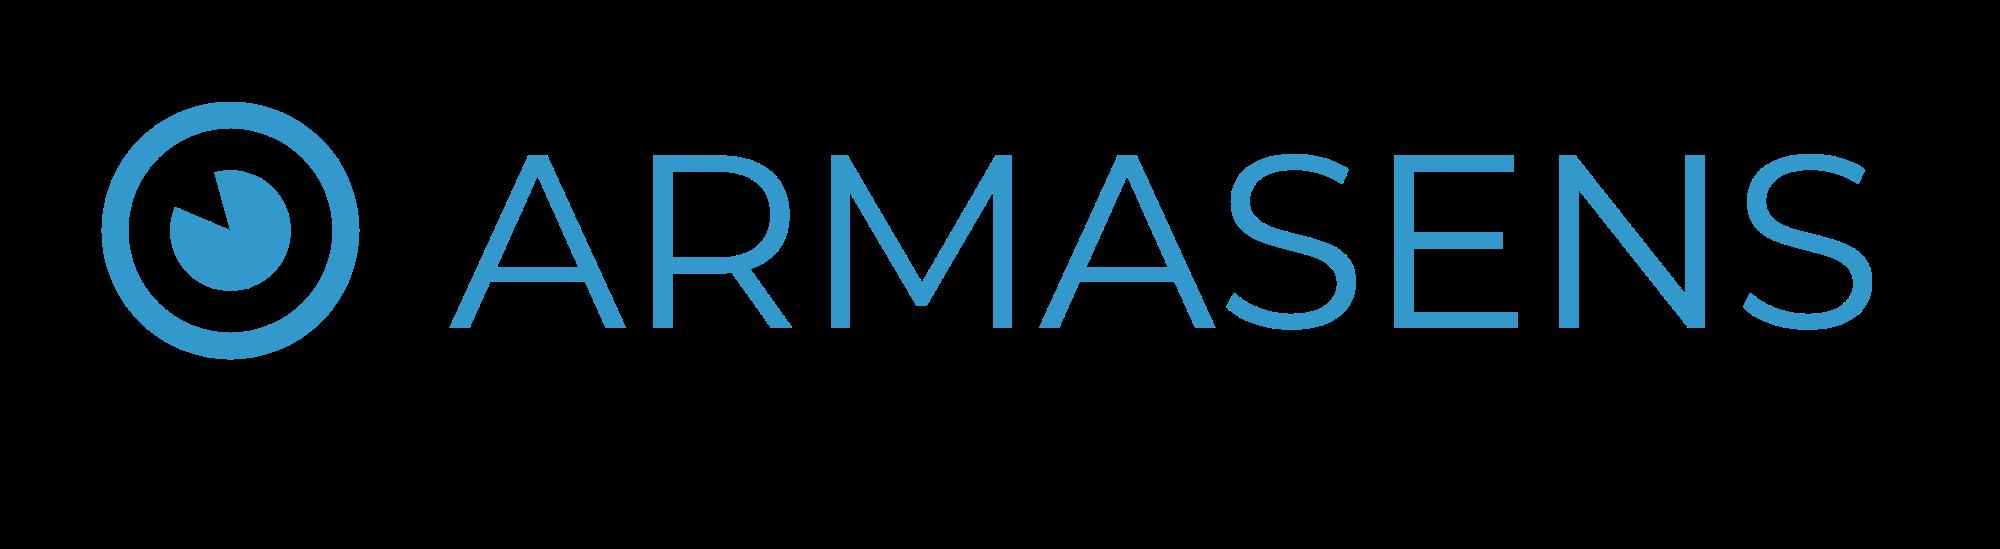 ARMASENS-logo (1)